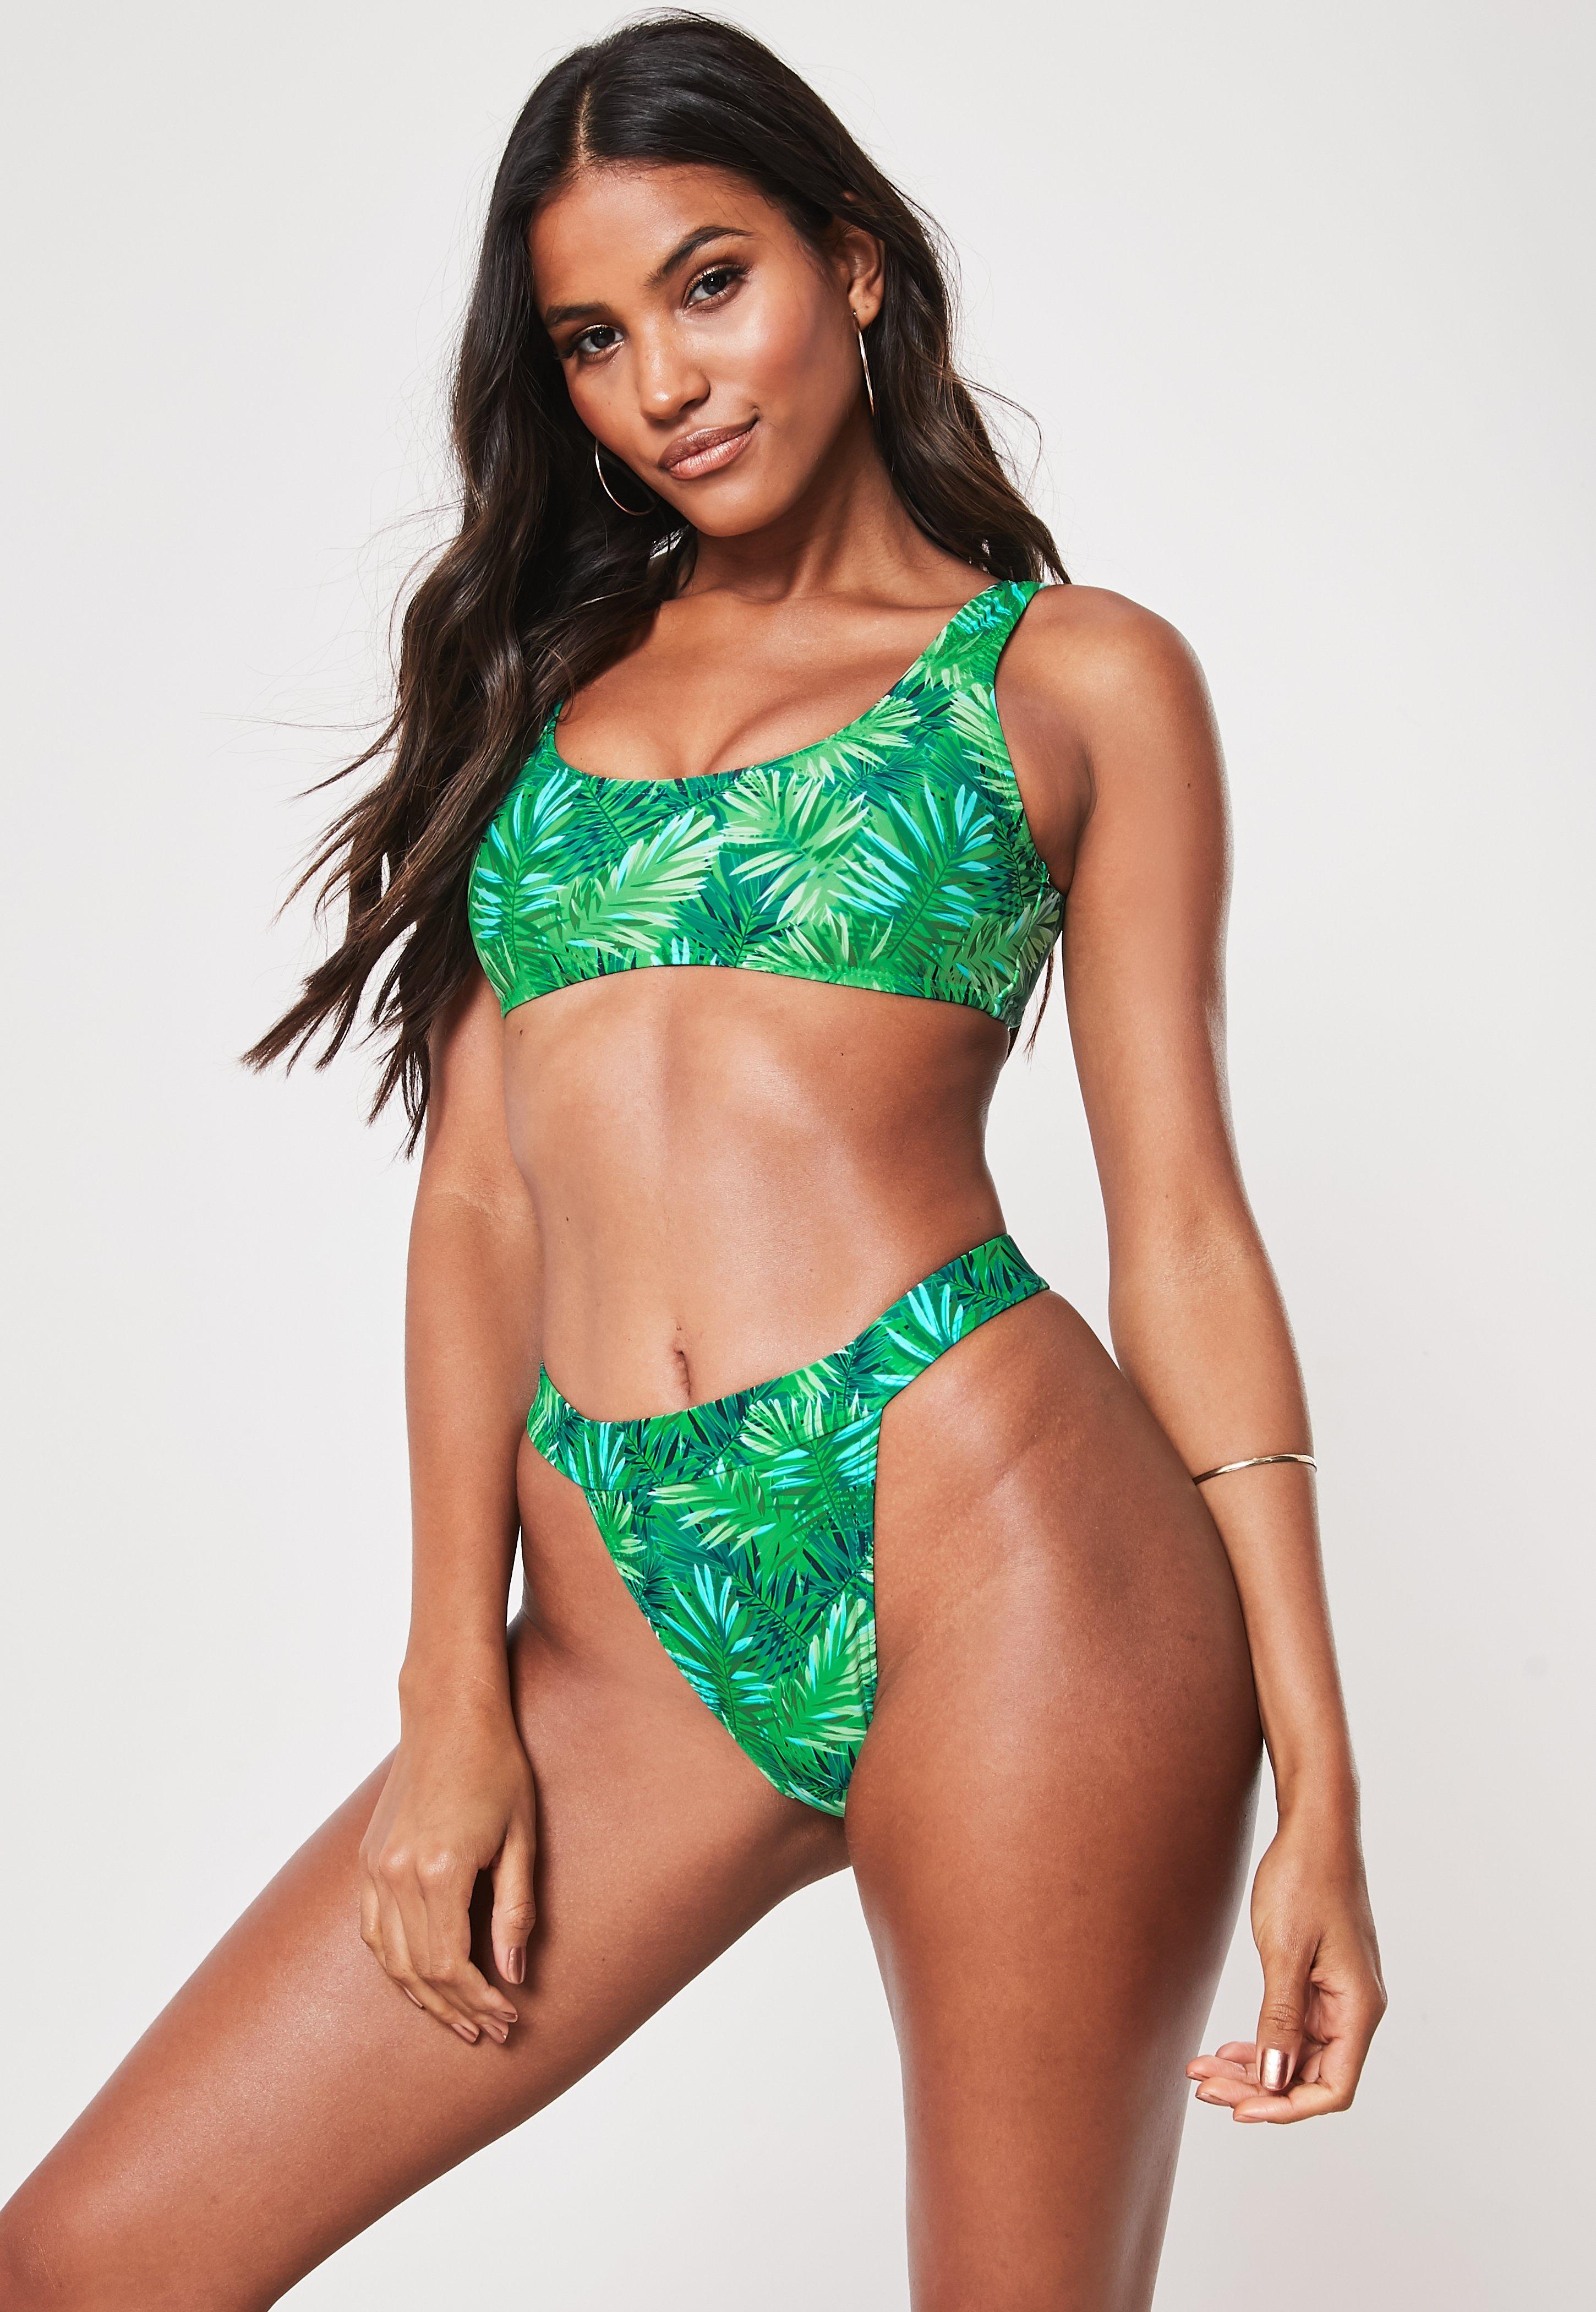 69f9cfed6aa69 Women's Bikinis, Push Up & Longline - Missguided